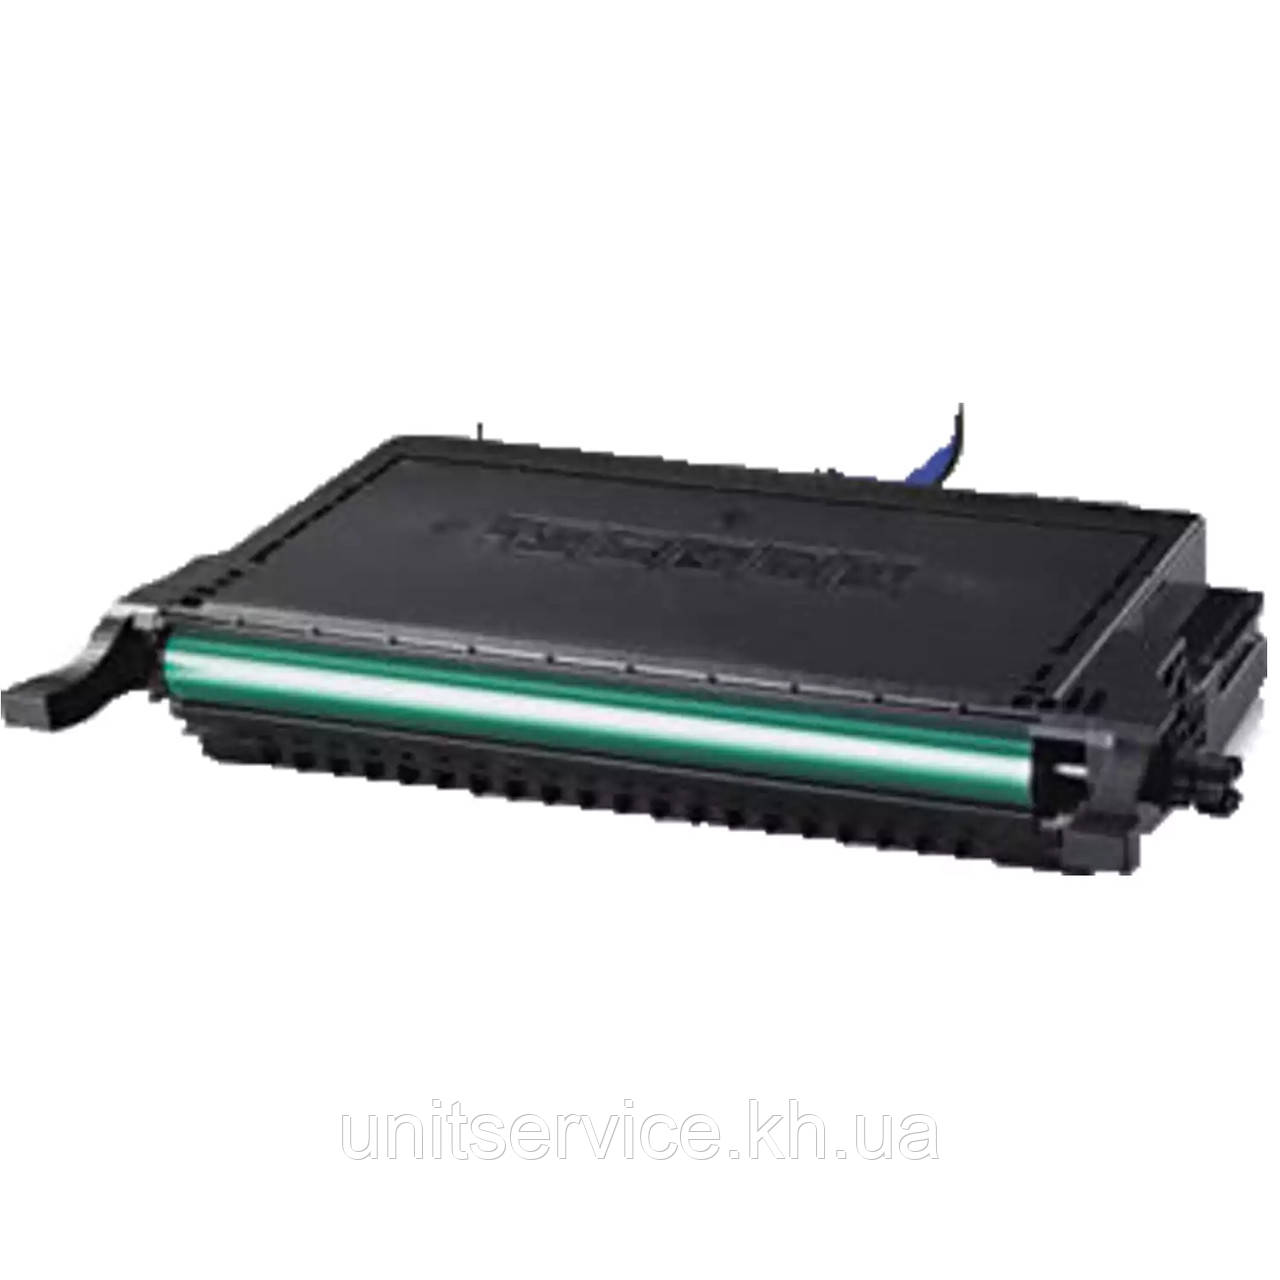 Картридж Samsung CLT-K660A для принтера Samsung CLP-610, CLP-660, CLX-6200, CLX-6210, CLX-6240